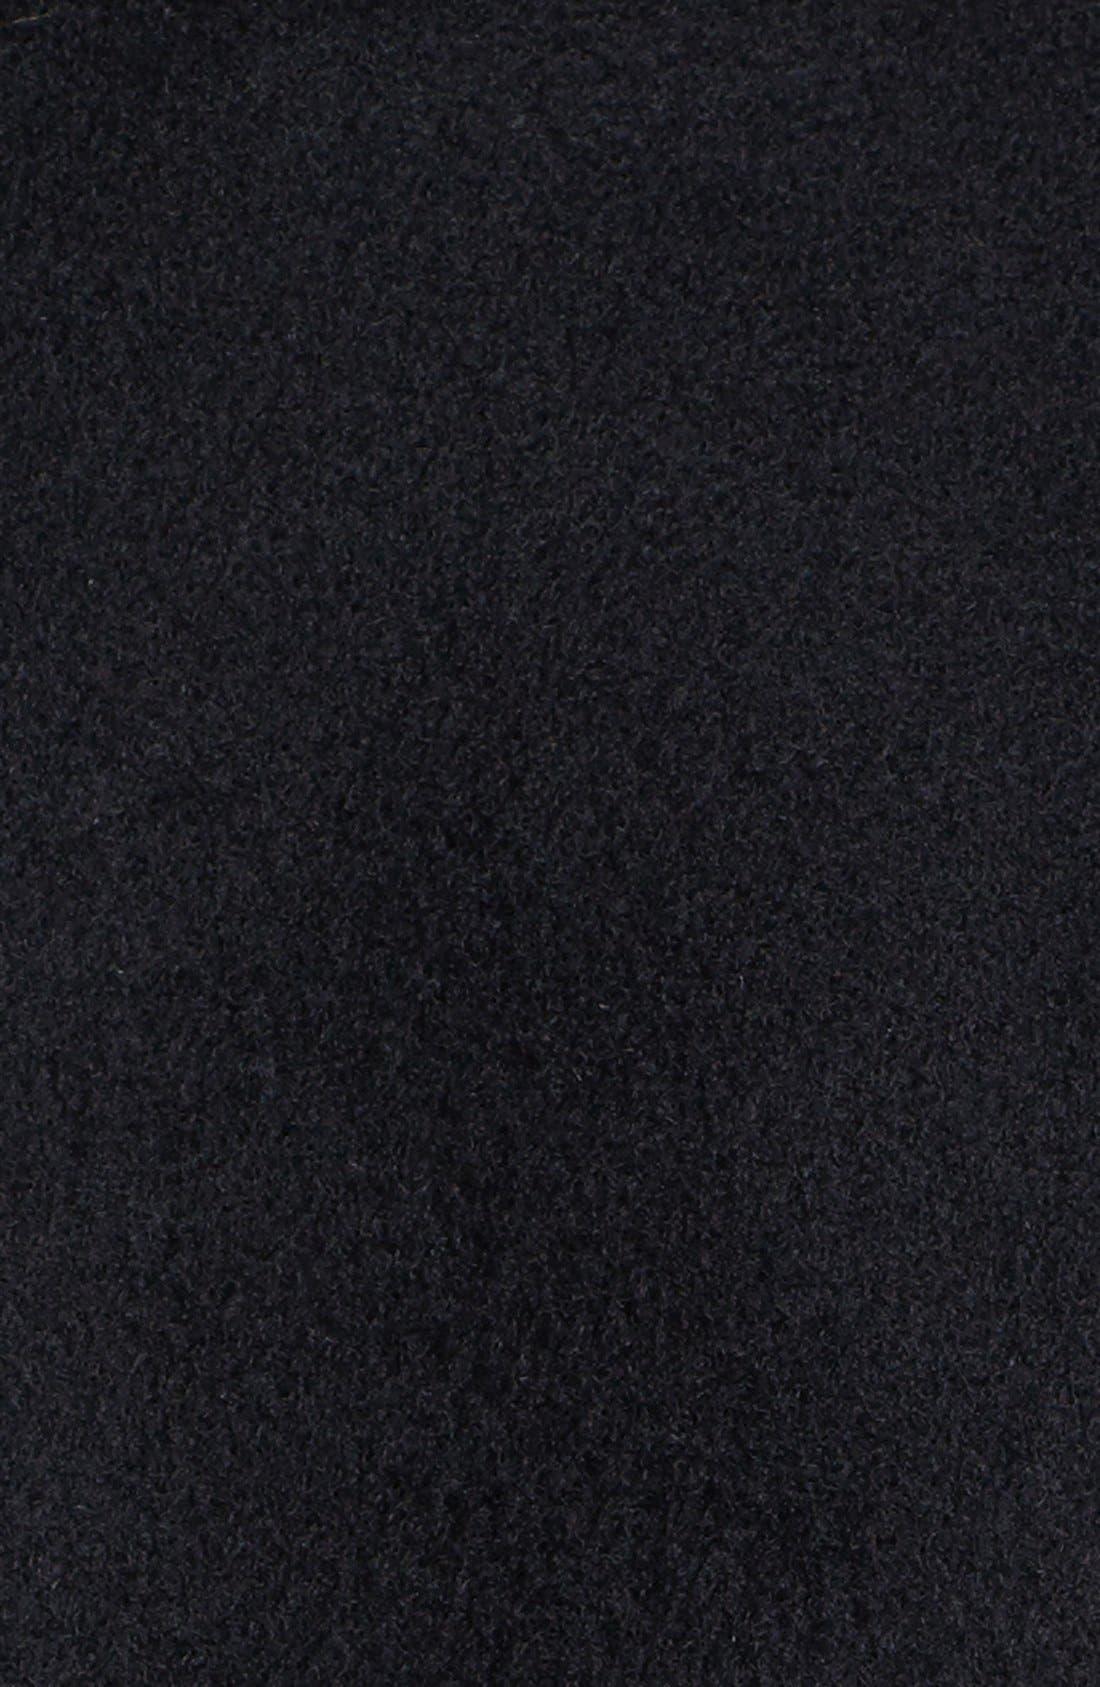 Couture Genuine Fox Fur Collar Coat,                             Alternate thumbnail 2, color,                             001